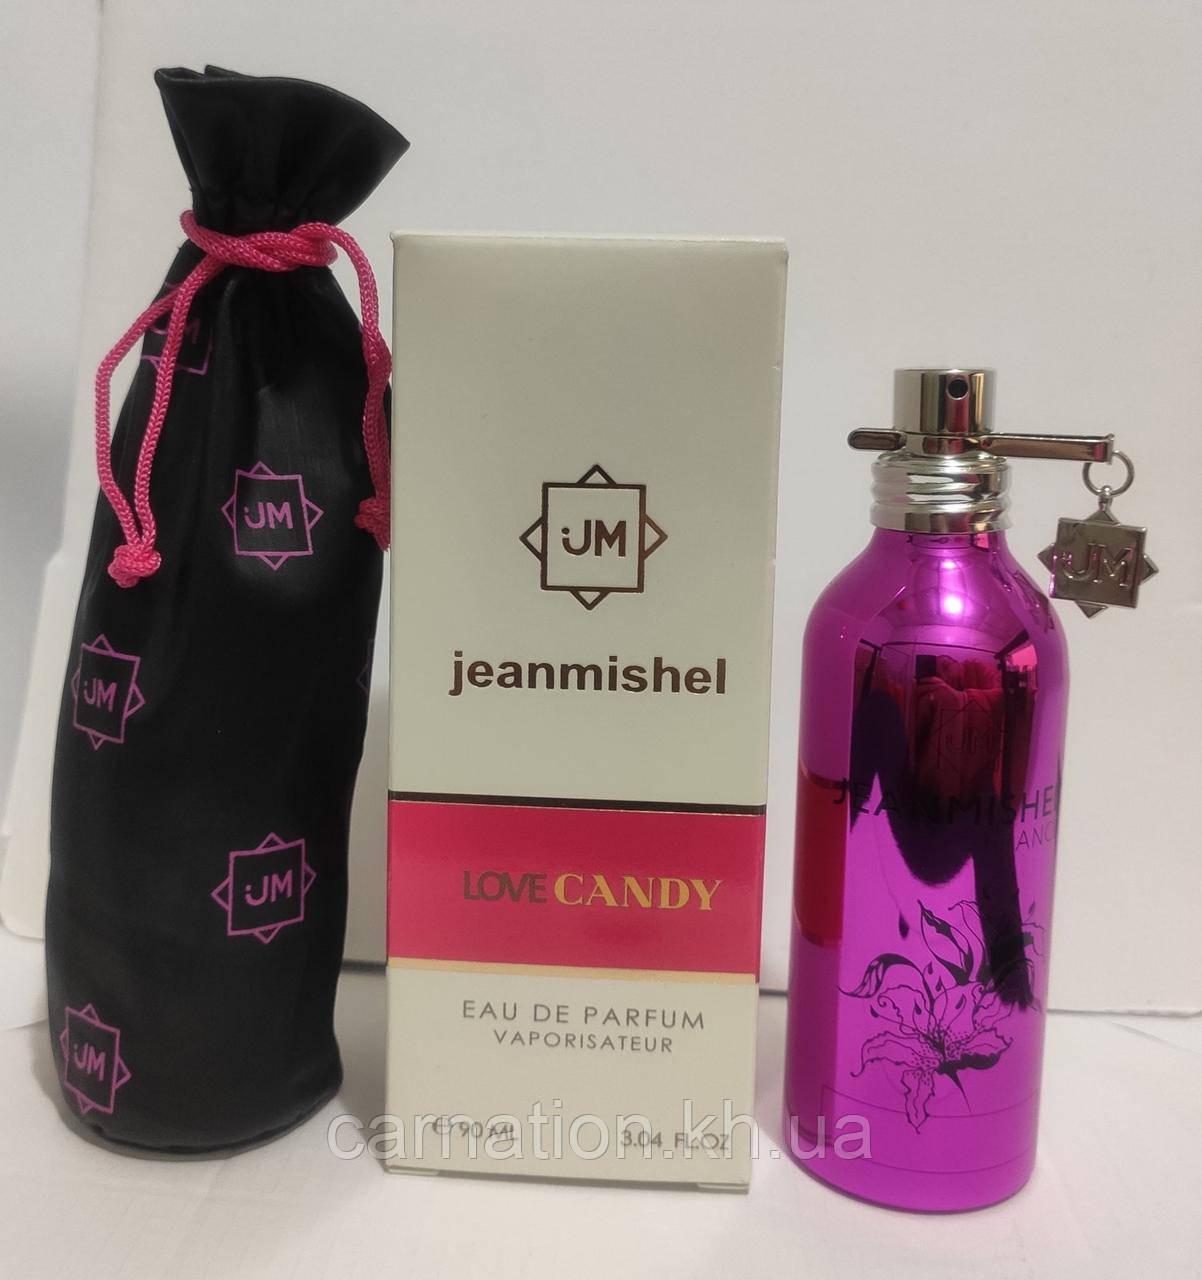 Жіноча парфумована вода Jeanmishel LoveCandy 90 мл